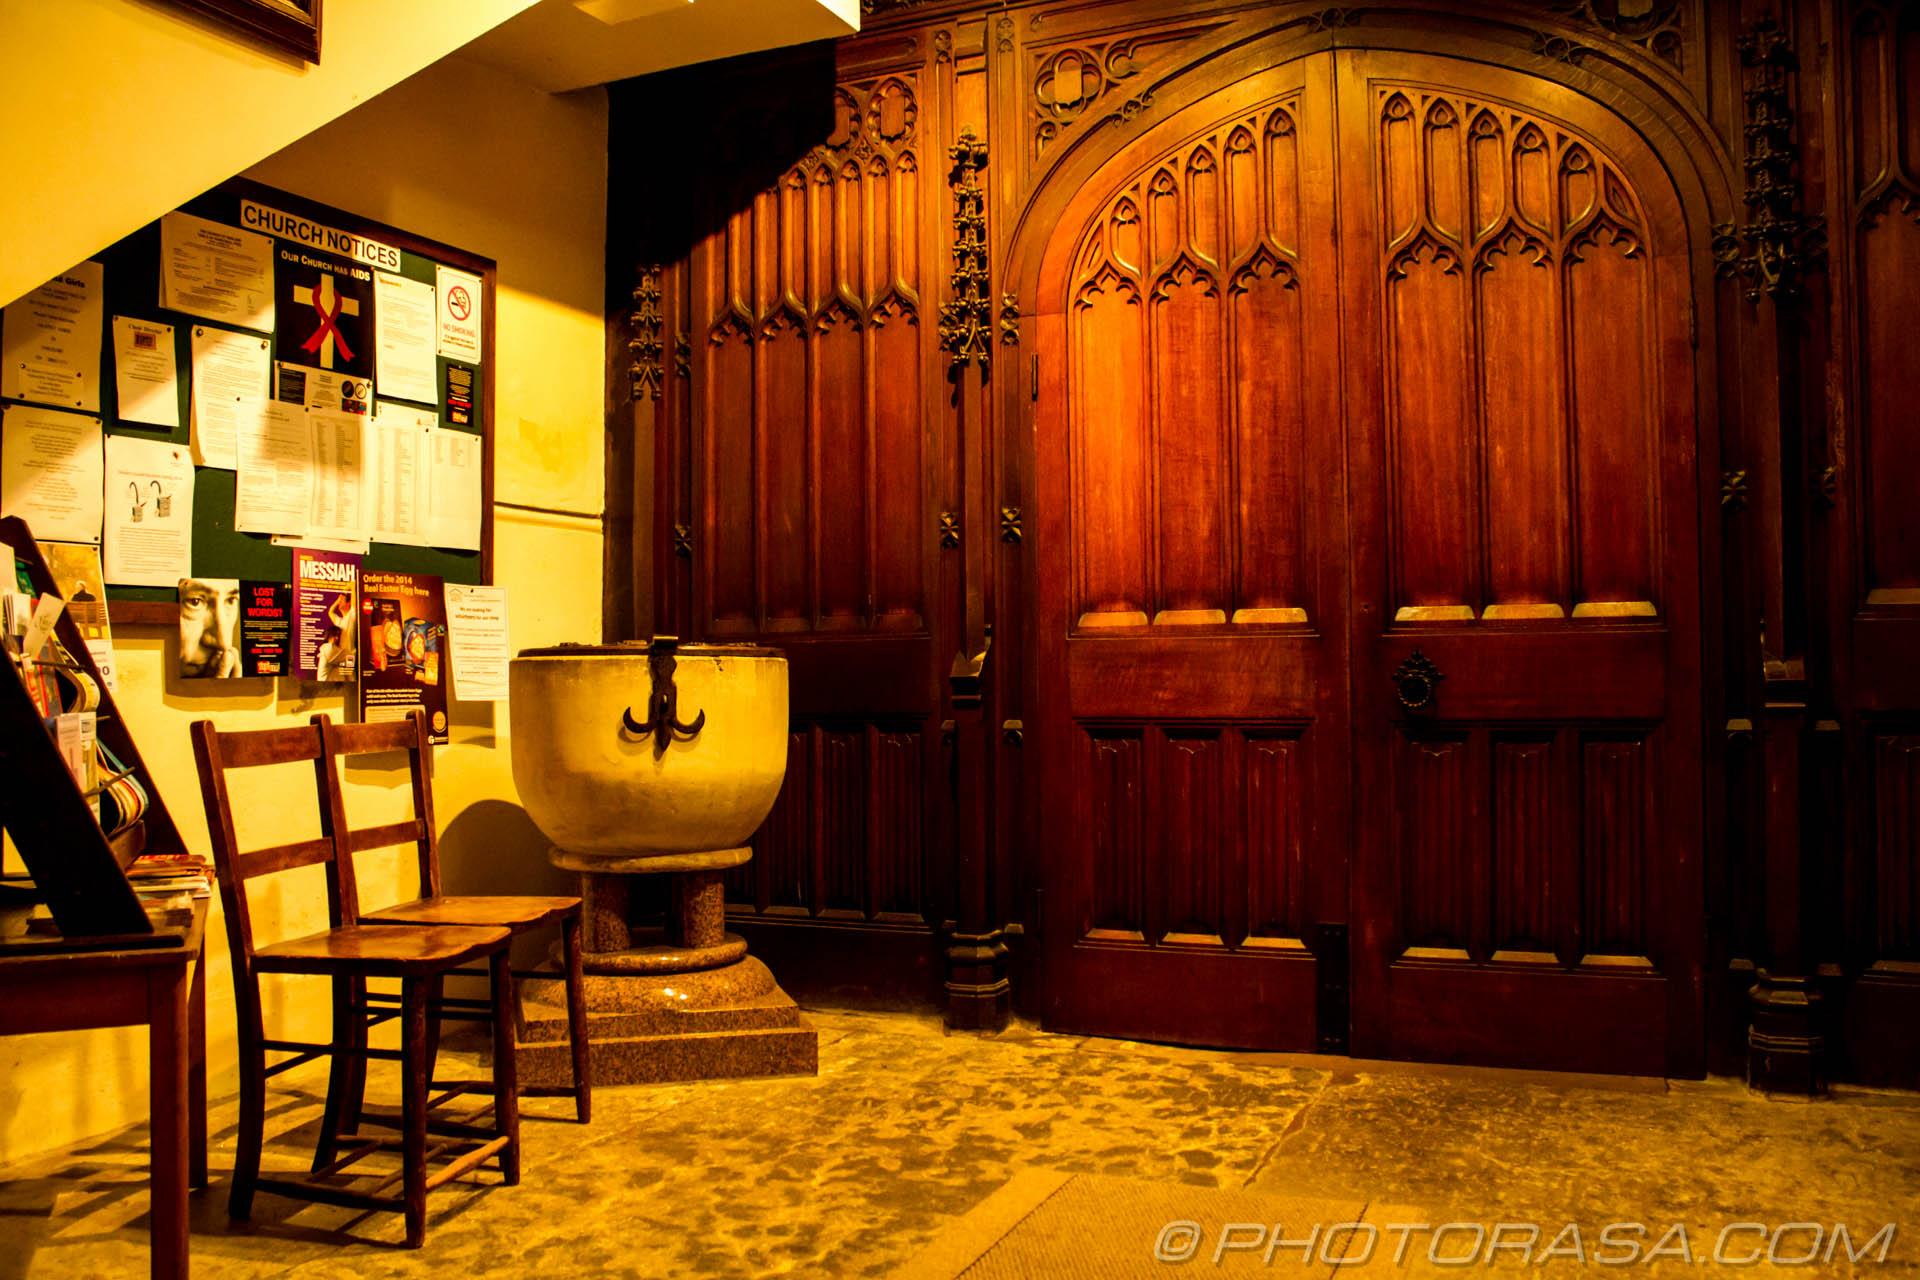 https://photorasa.com/saints-church-staplehurst-kent/entrance-door-and-font-2/